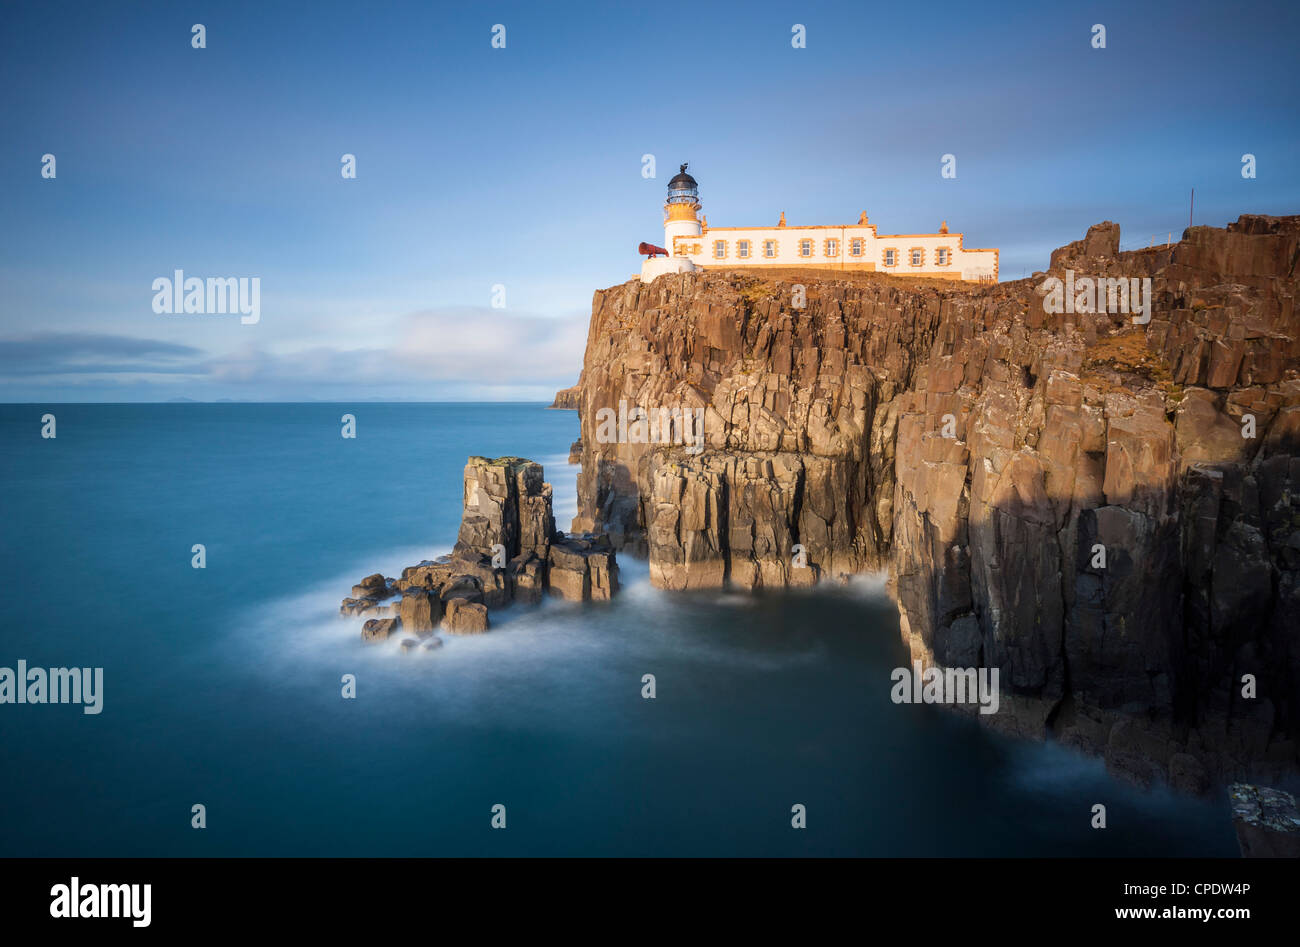 Neist Point lighthouse, Isle of Skye, Scotland, UK Stock Photo